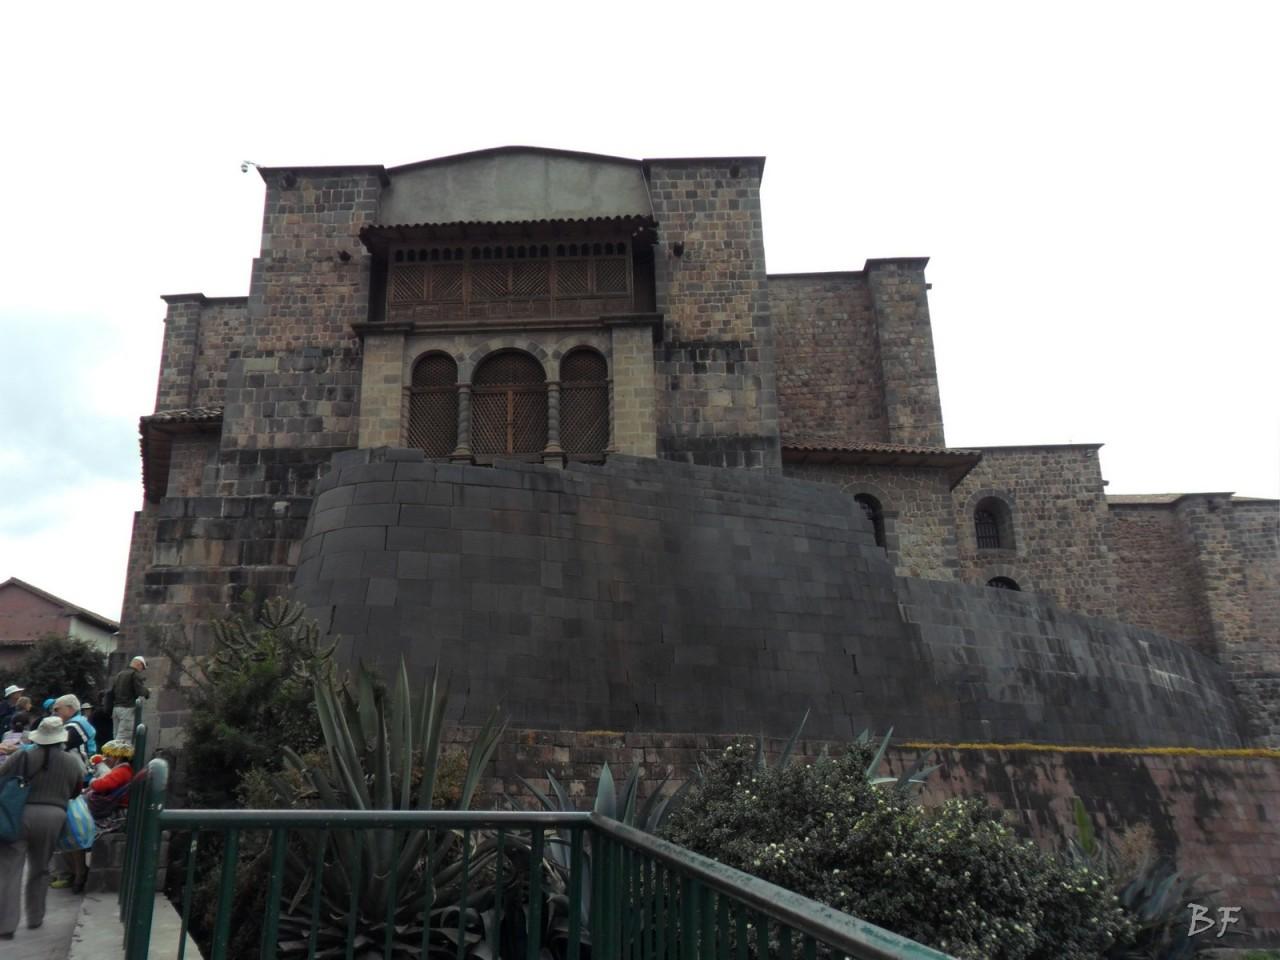 Mura-Poligonali-Megaliti-Tempio-Coricancha-Cusco-Perù-3